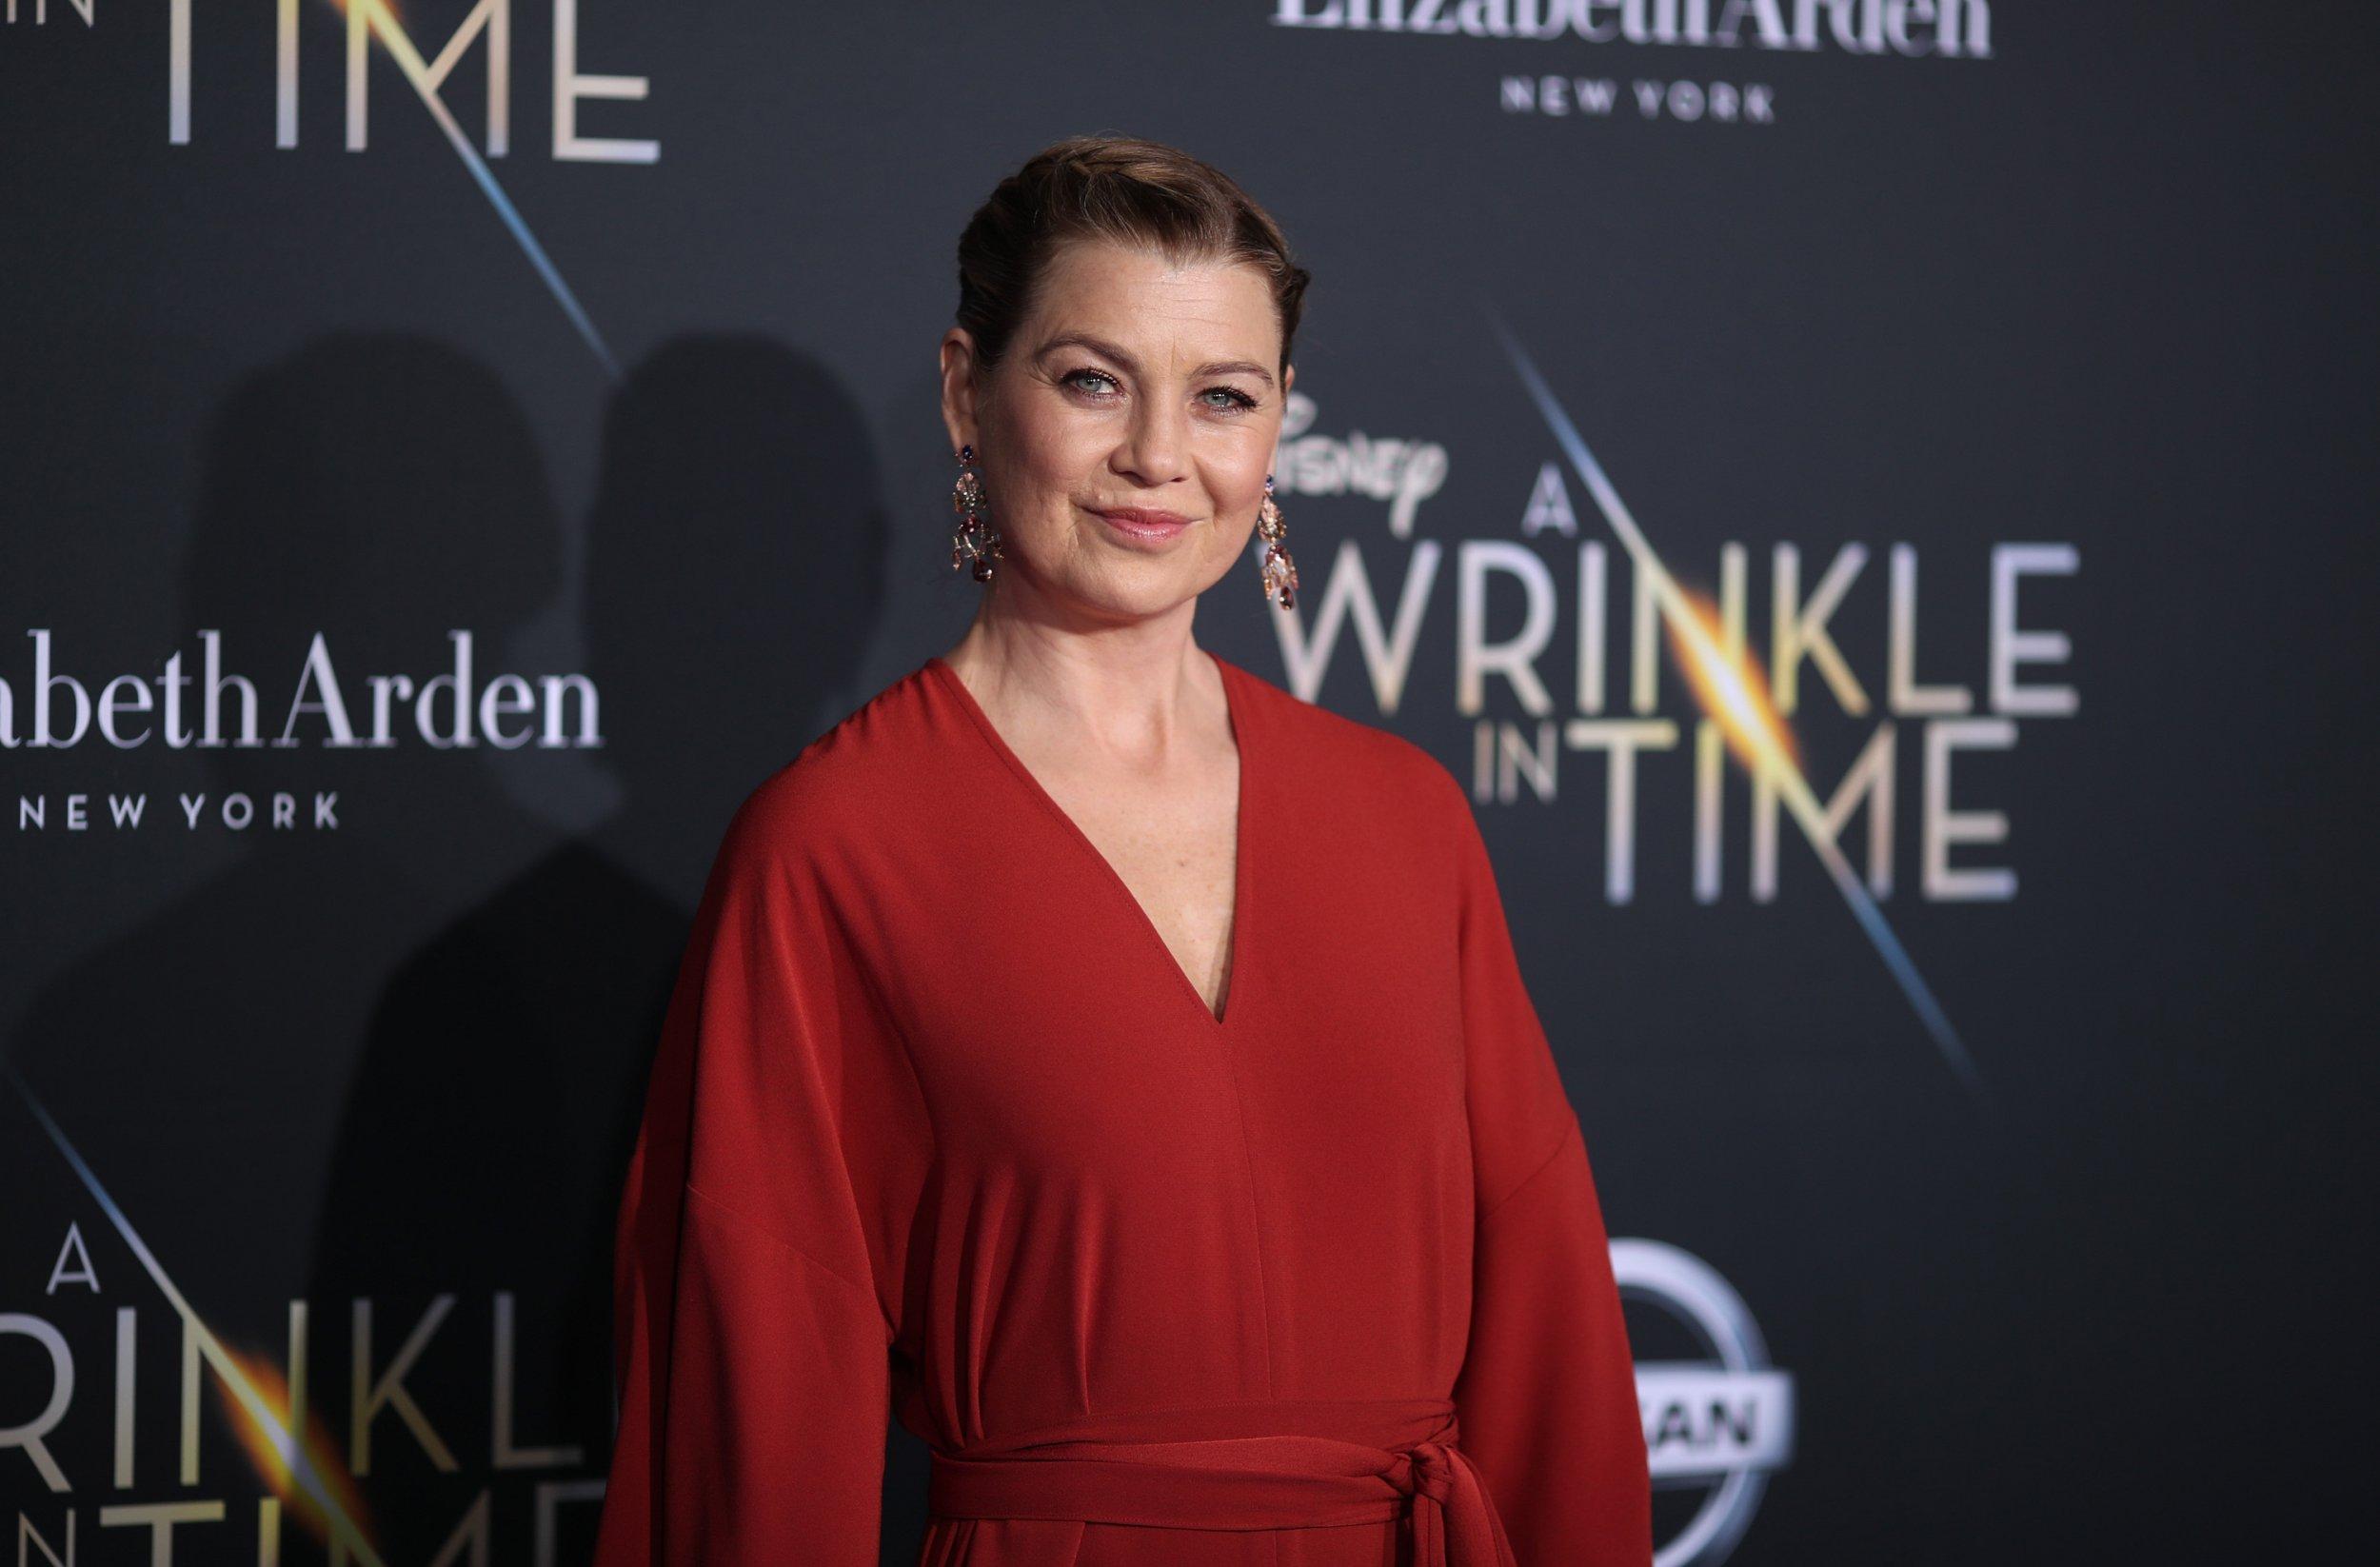 Ellen Pompeo's 'Grey's Anatomy' Pay Raise Isn't Why Co-Stars Jessica Capshaw and Sarah Drew Left the Show